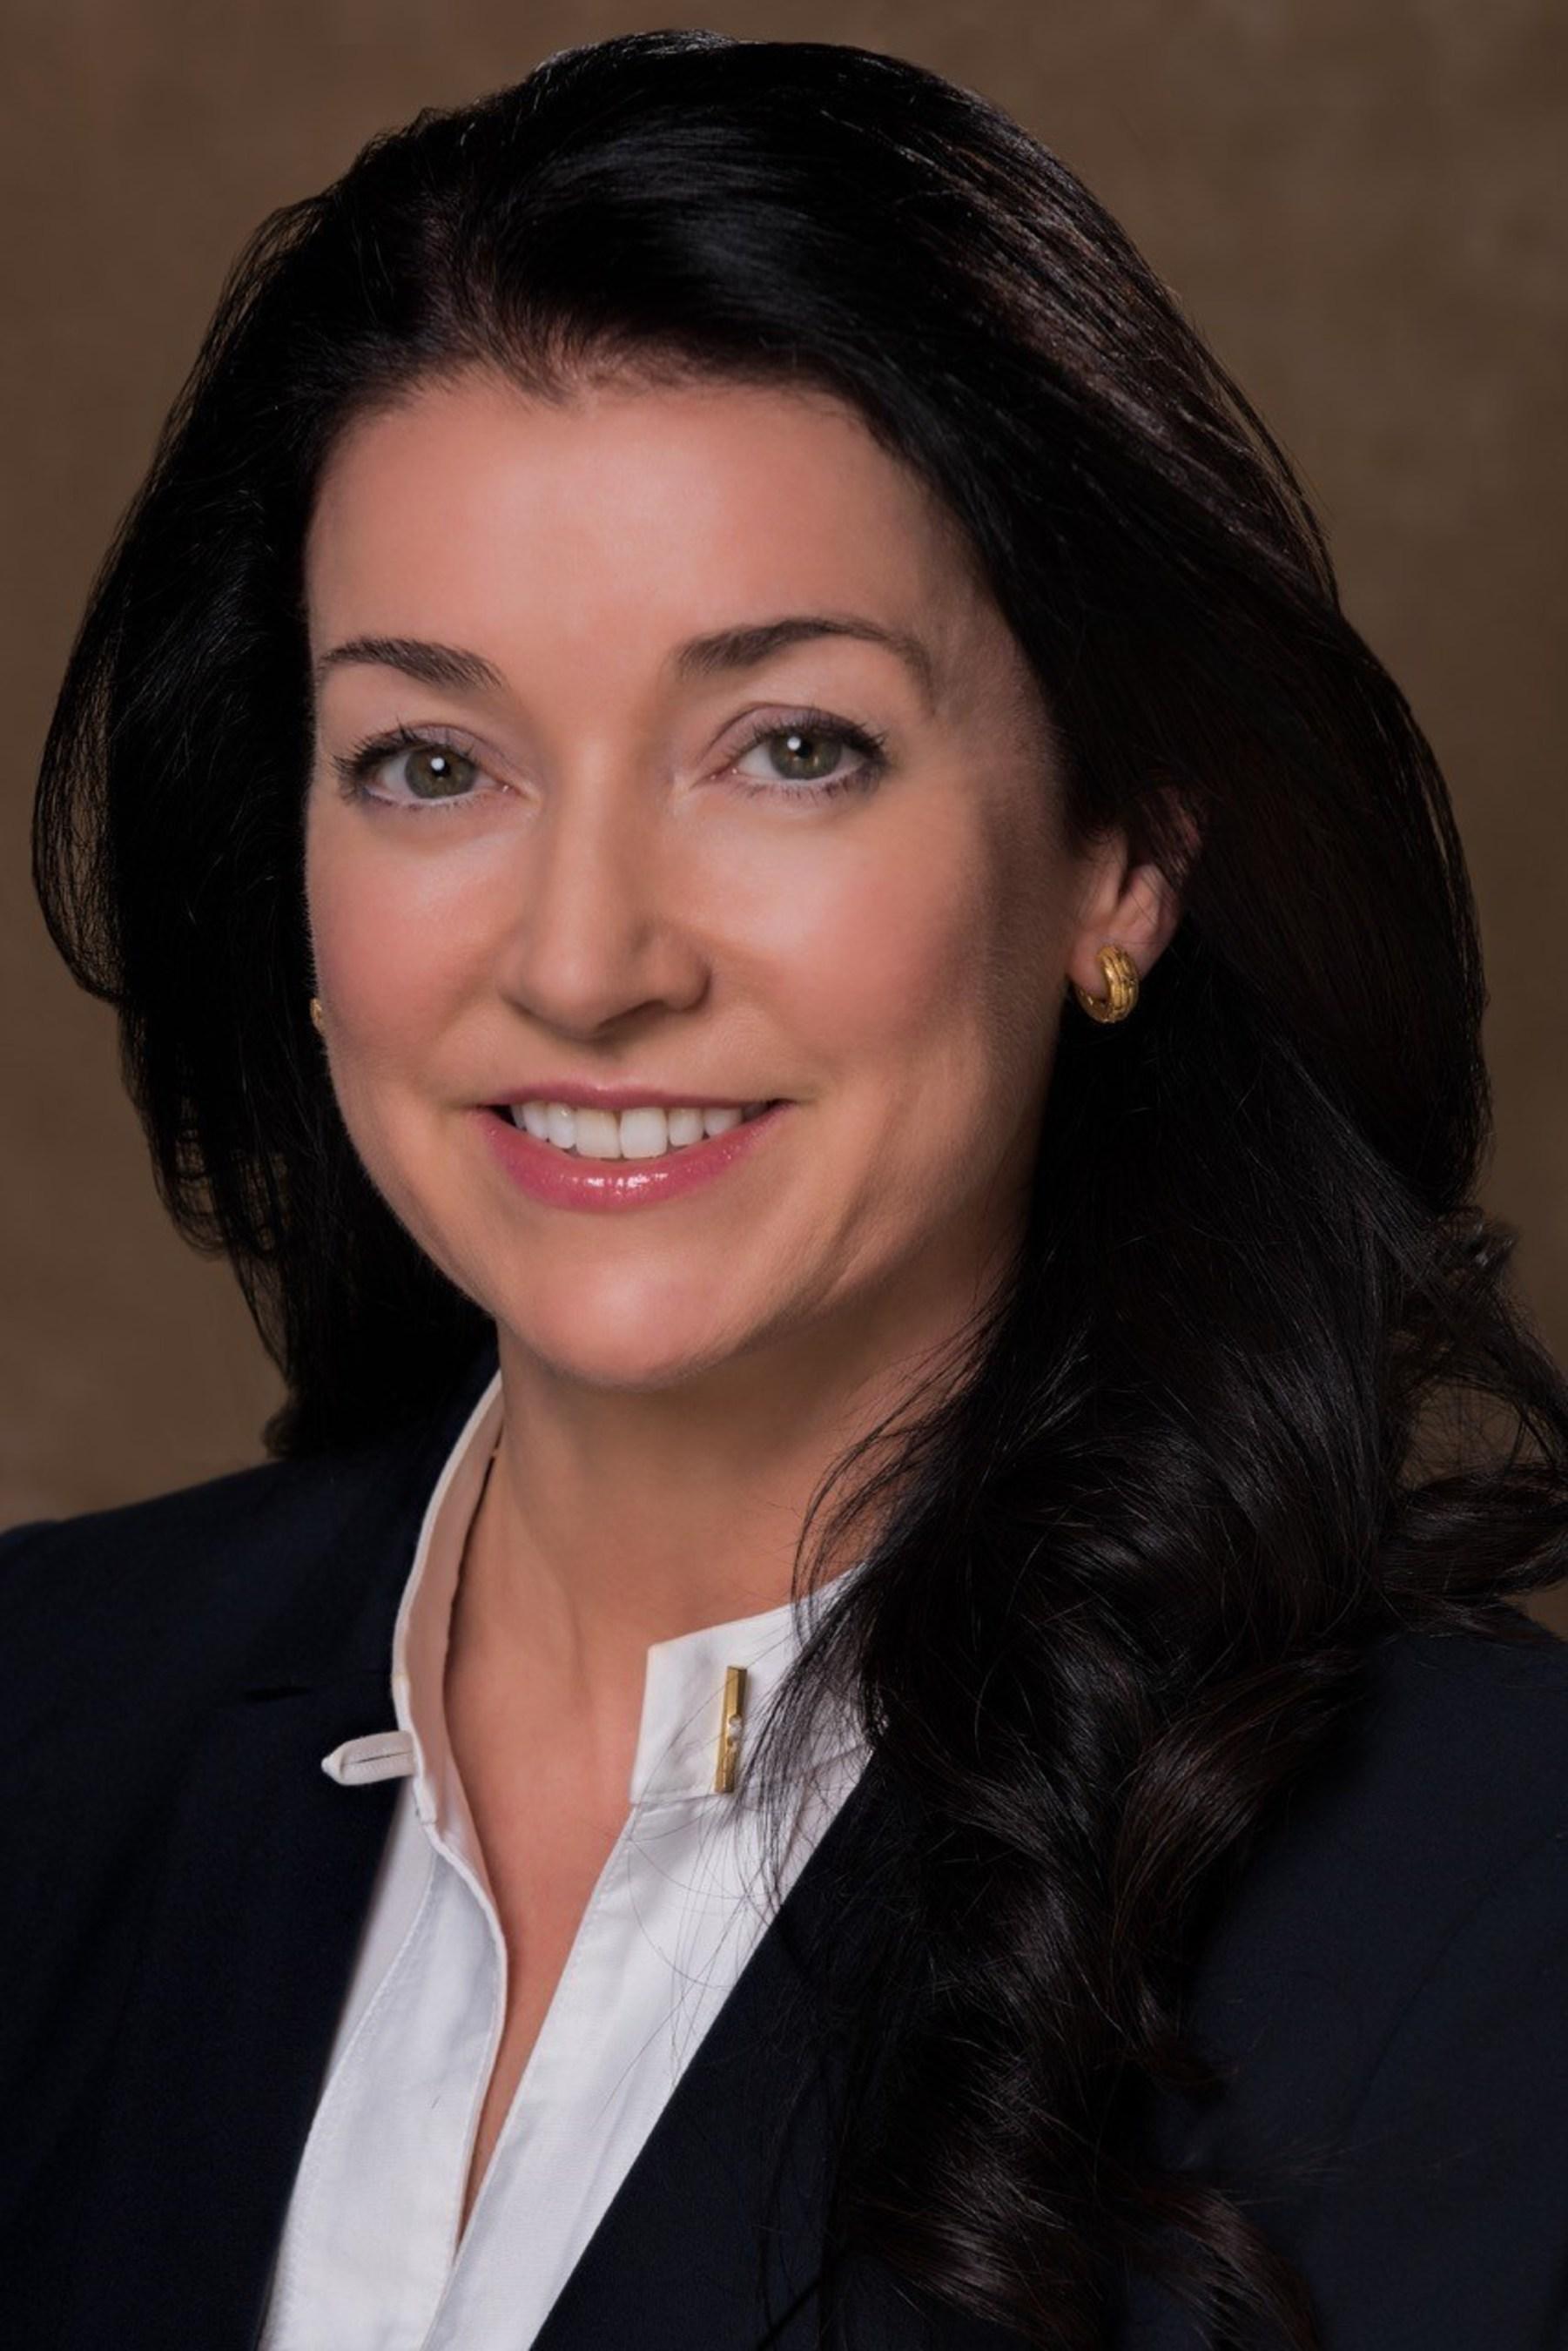 LogistiCare Vice President of Managed Care Sales Caroline Smyth